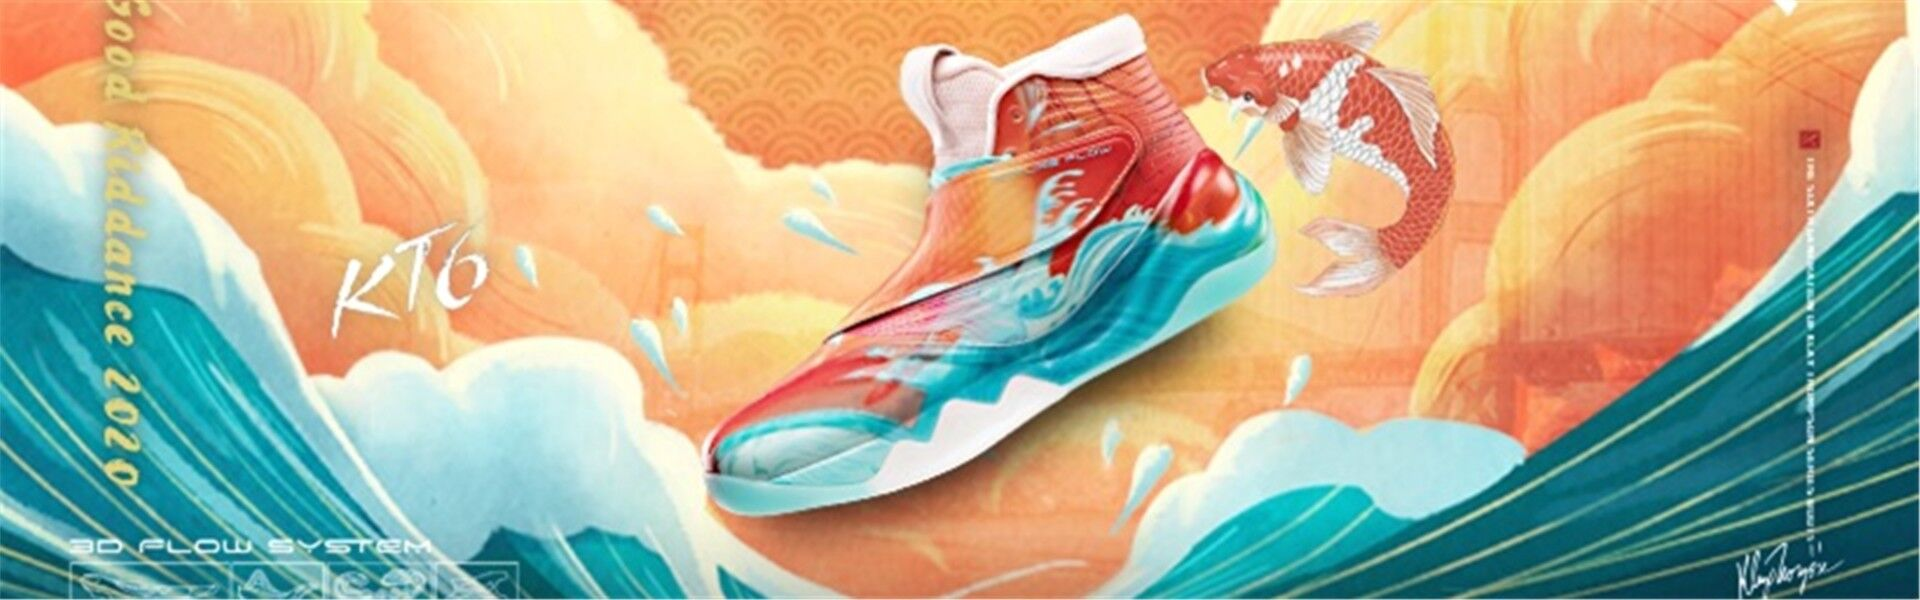 Anta KT6 Sneakers